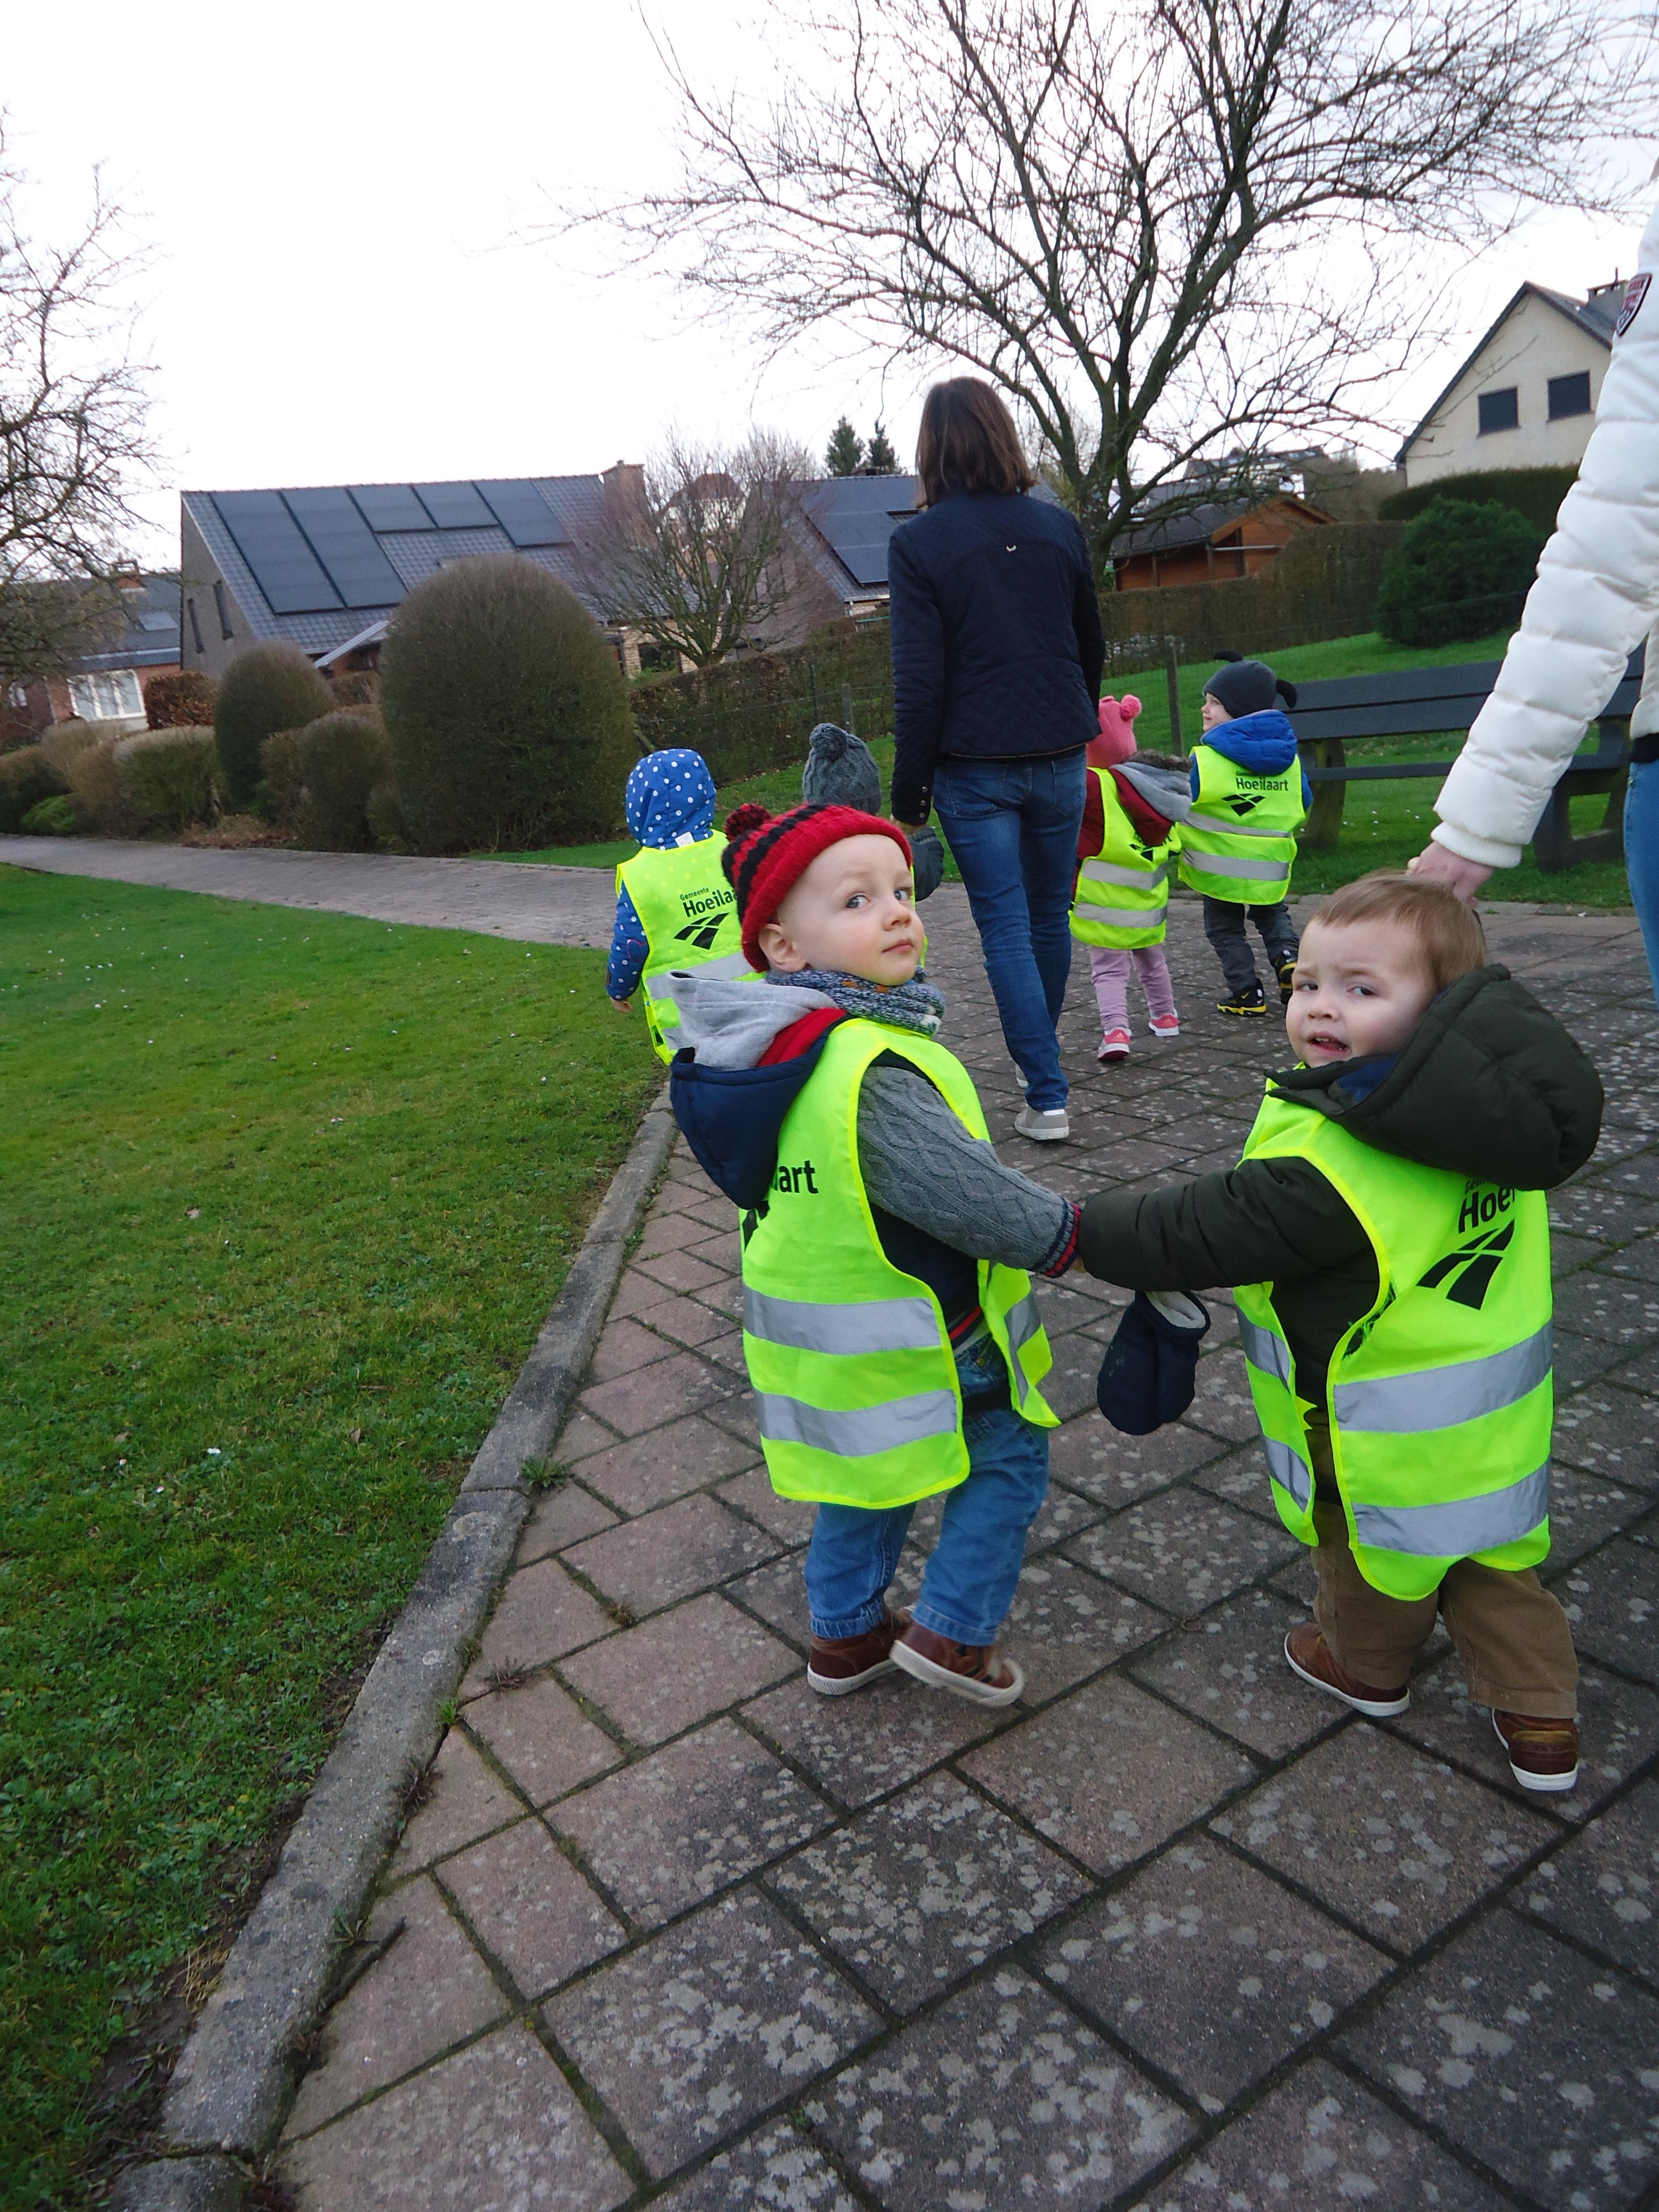 Wandeling kinderdagverblijf